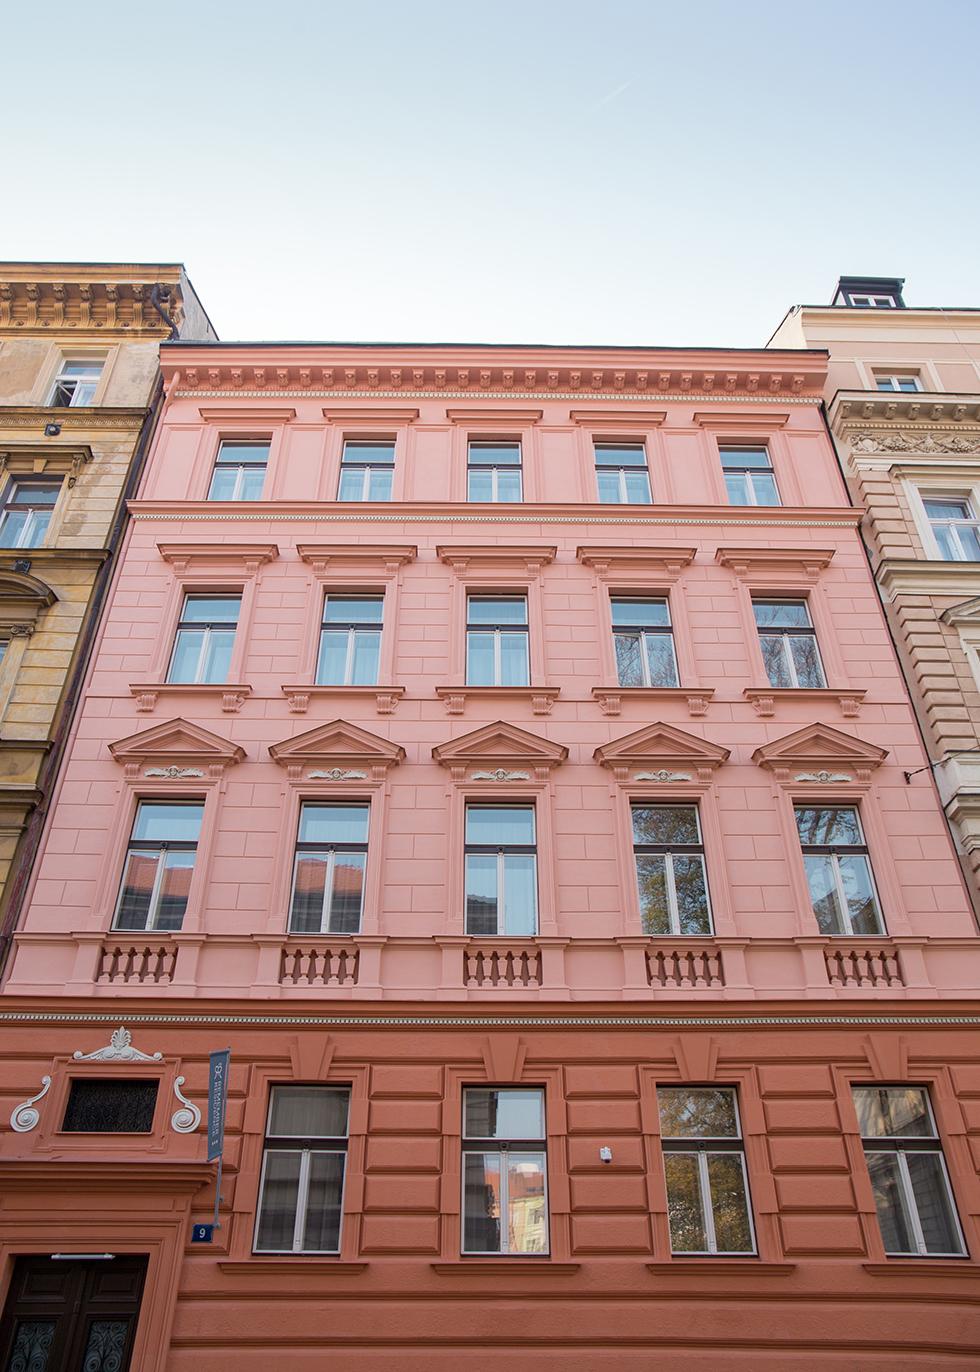 PRAGUE HOTEL RECOMMENDATION